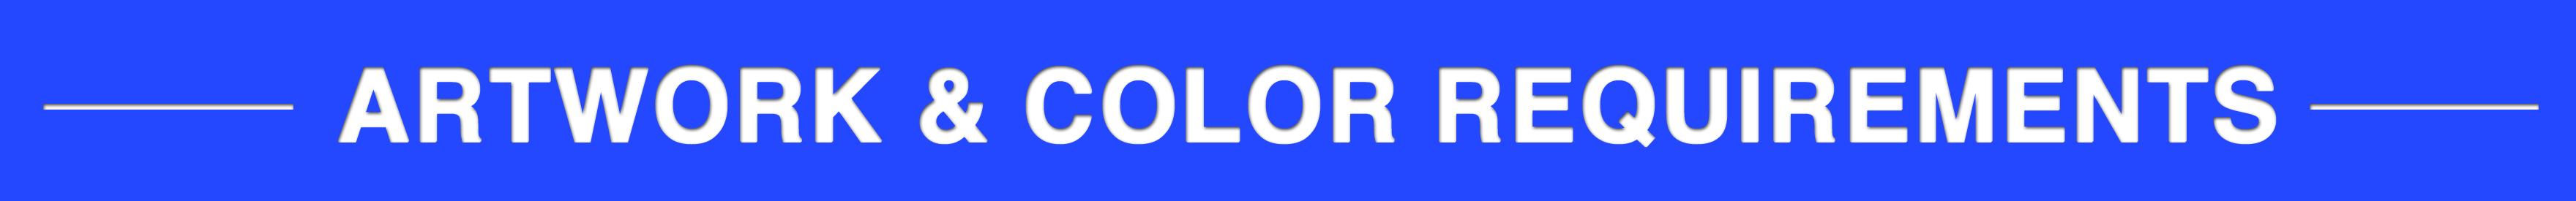 label-art-color-requirements.jpg